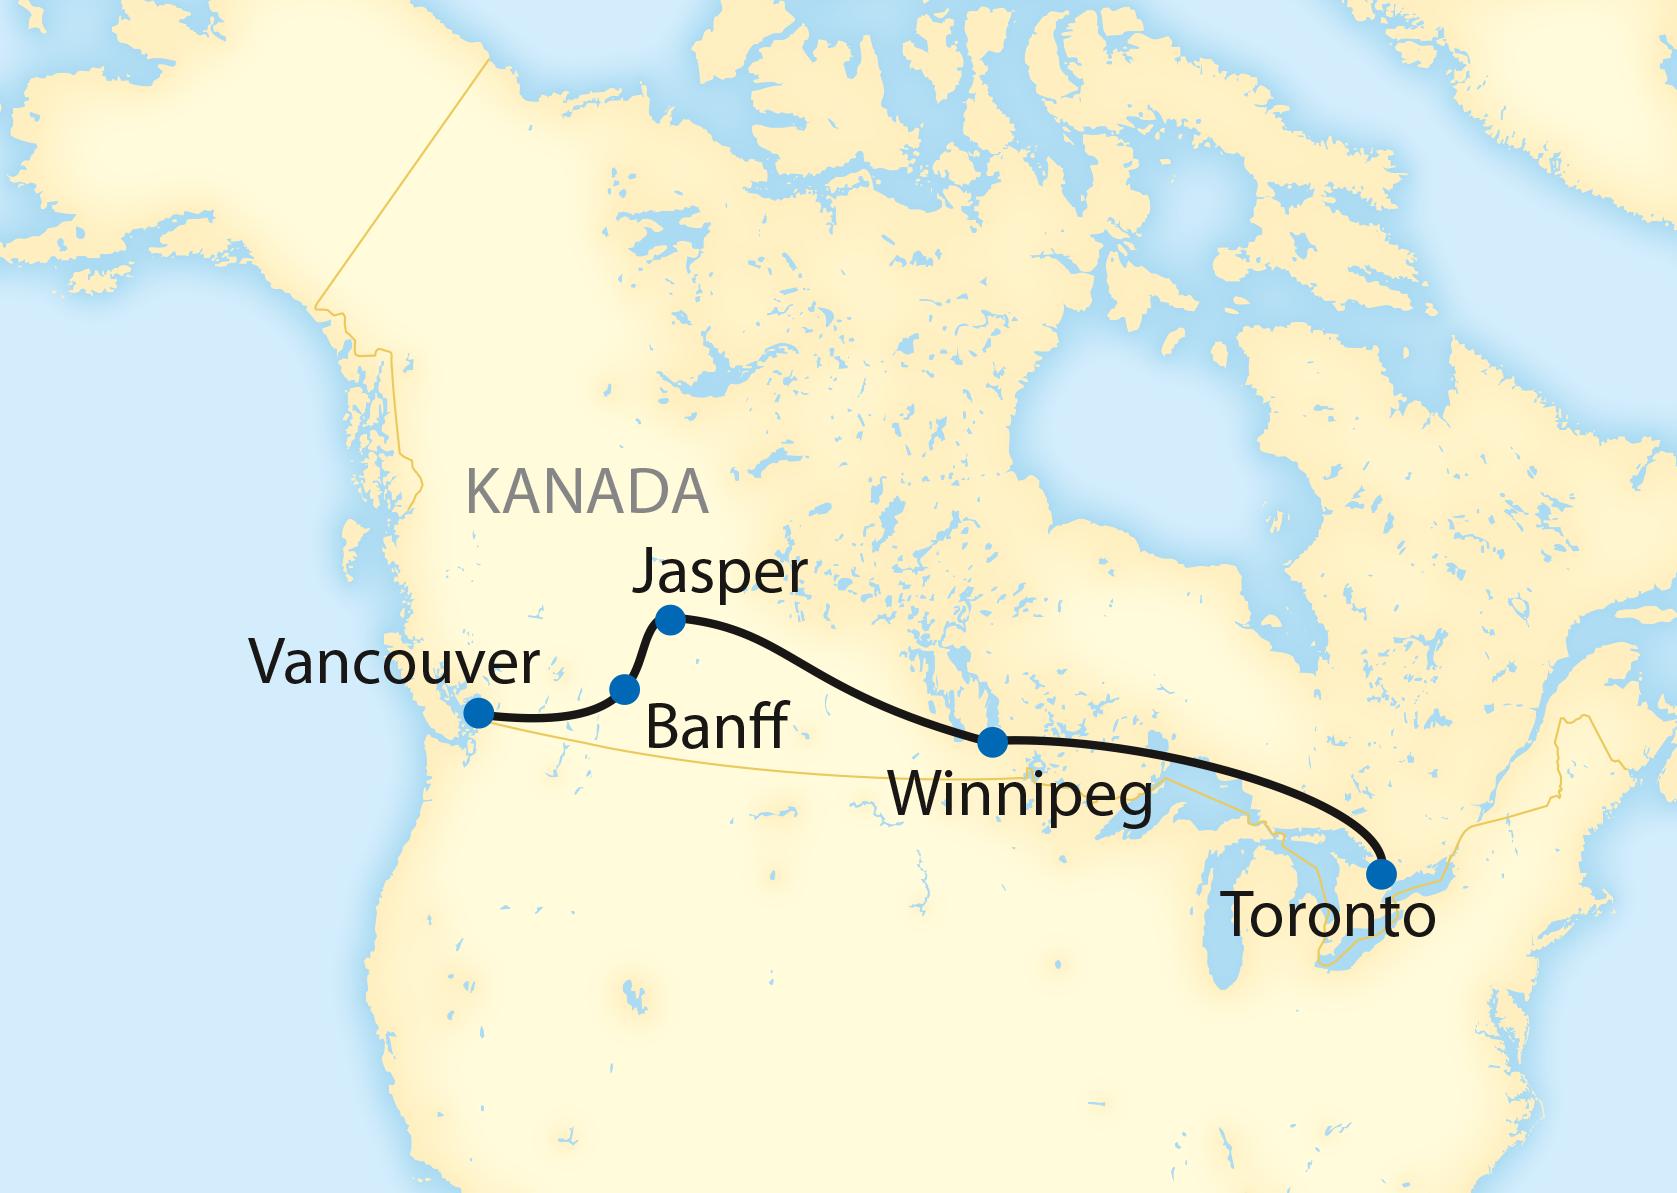 Kanada per Zug: Die klassische Variante (2020)